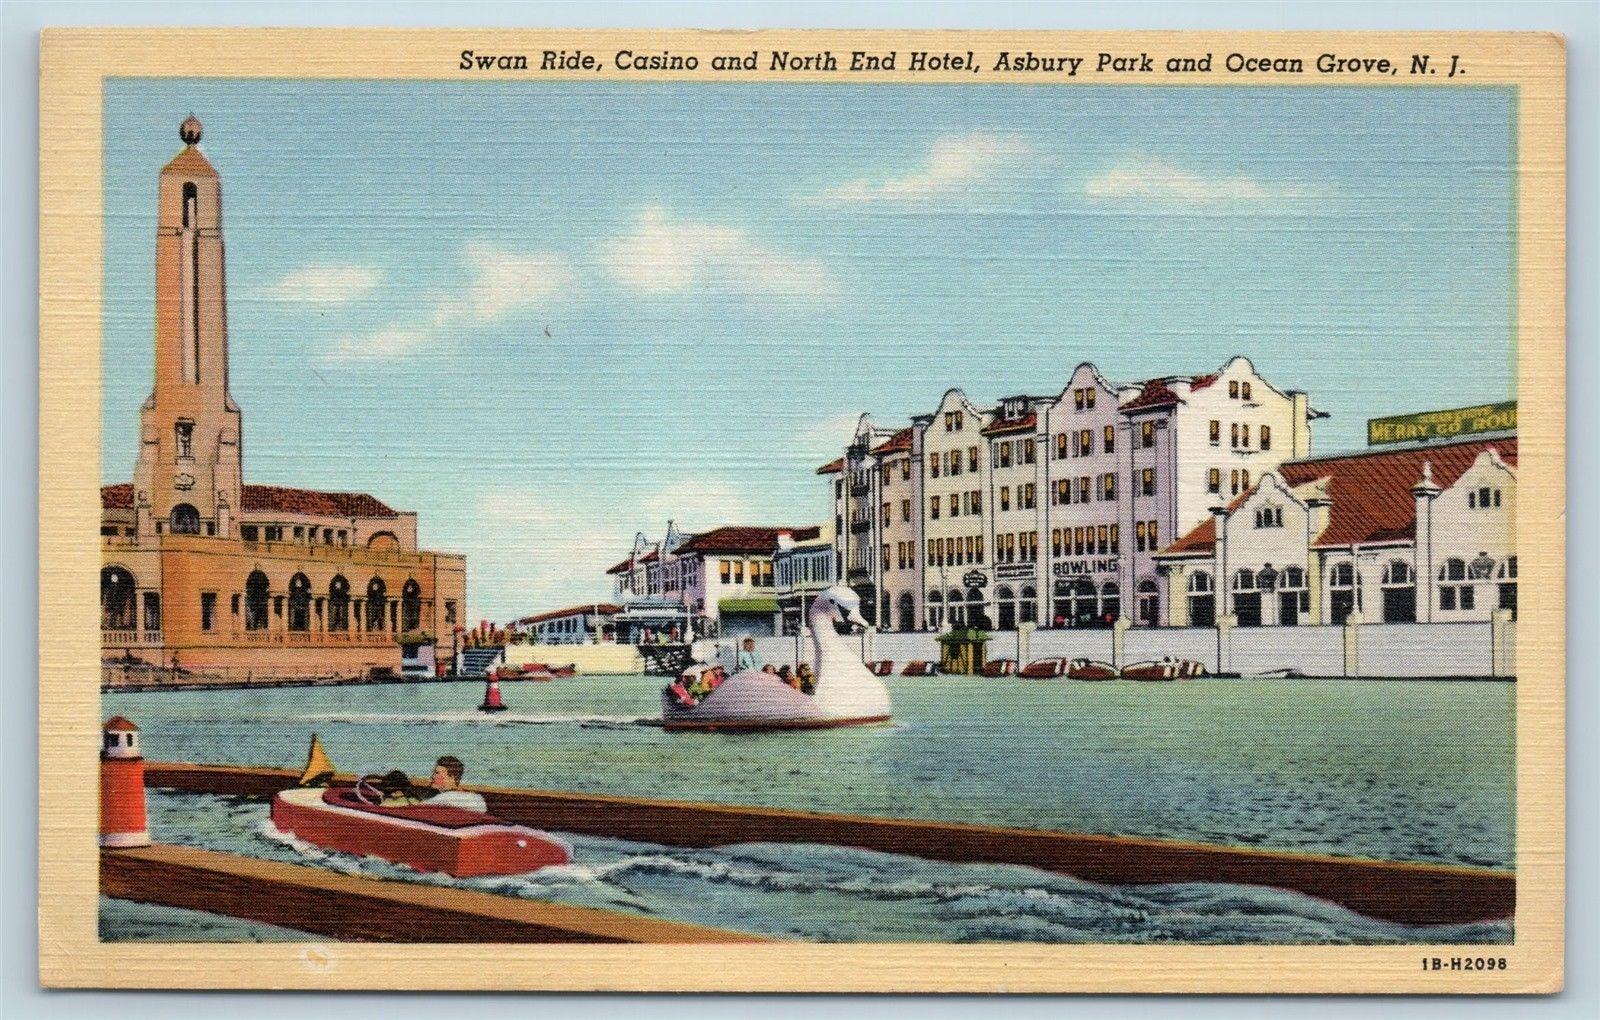 Postcard Nj Ocean Grove Asbury Park Swan Boat Rides Casino